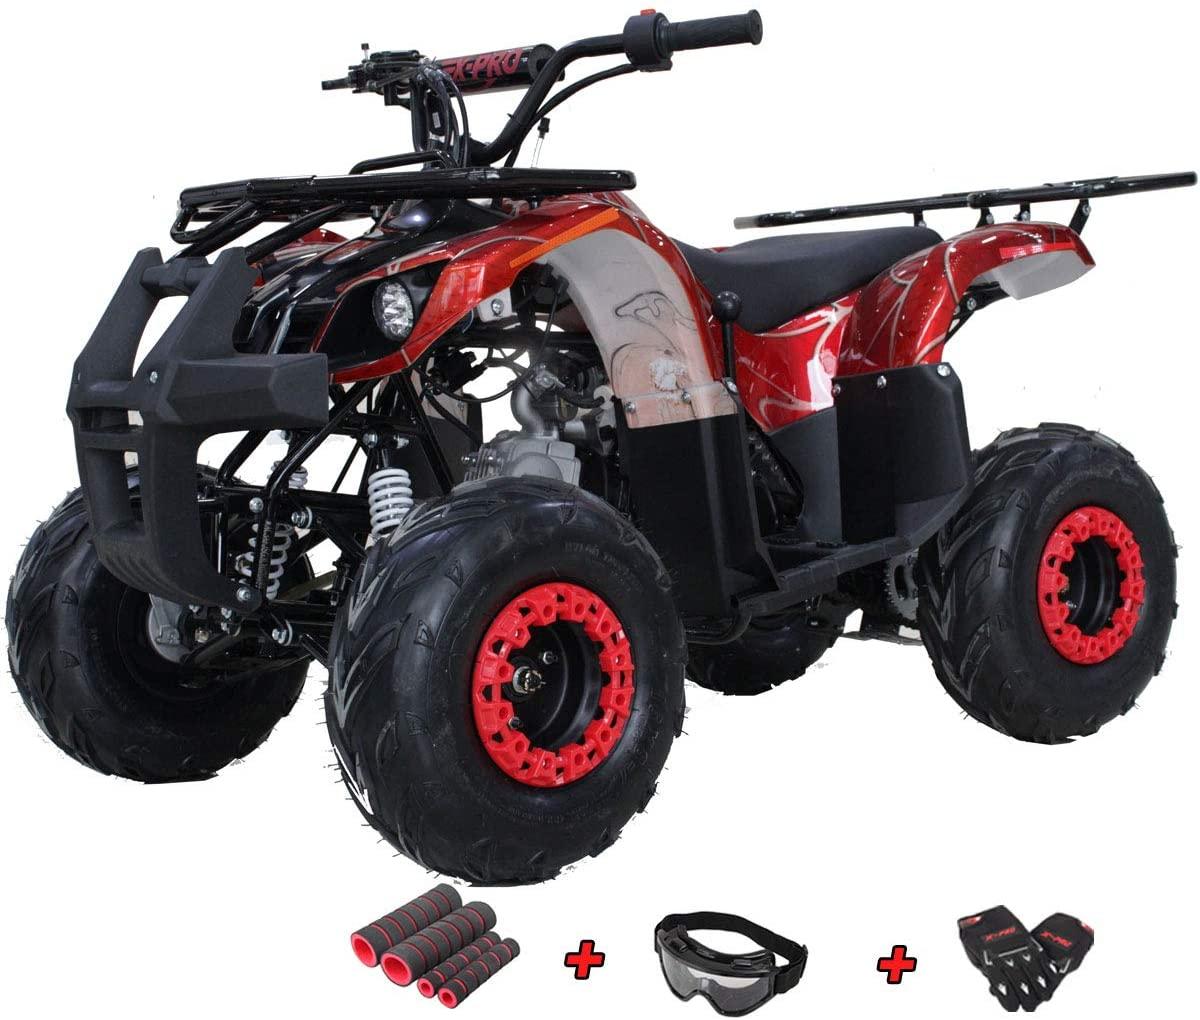 X-PRO Eagle 125 ATV Quad Youth 4 Wheeler ATVs Kid Size ATV 4 Wheelers 125cc Big Boys ATVs Quads with Gloves, Goggle and Handgrip (Spider Red)